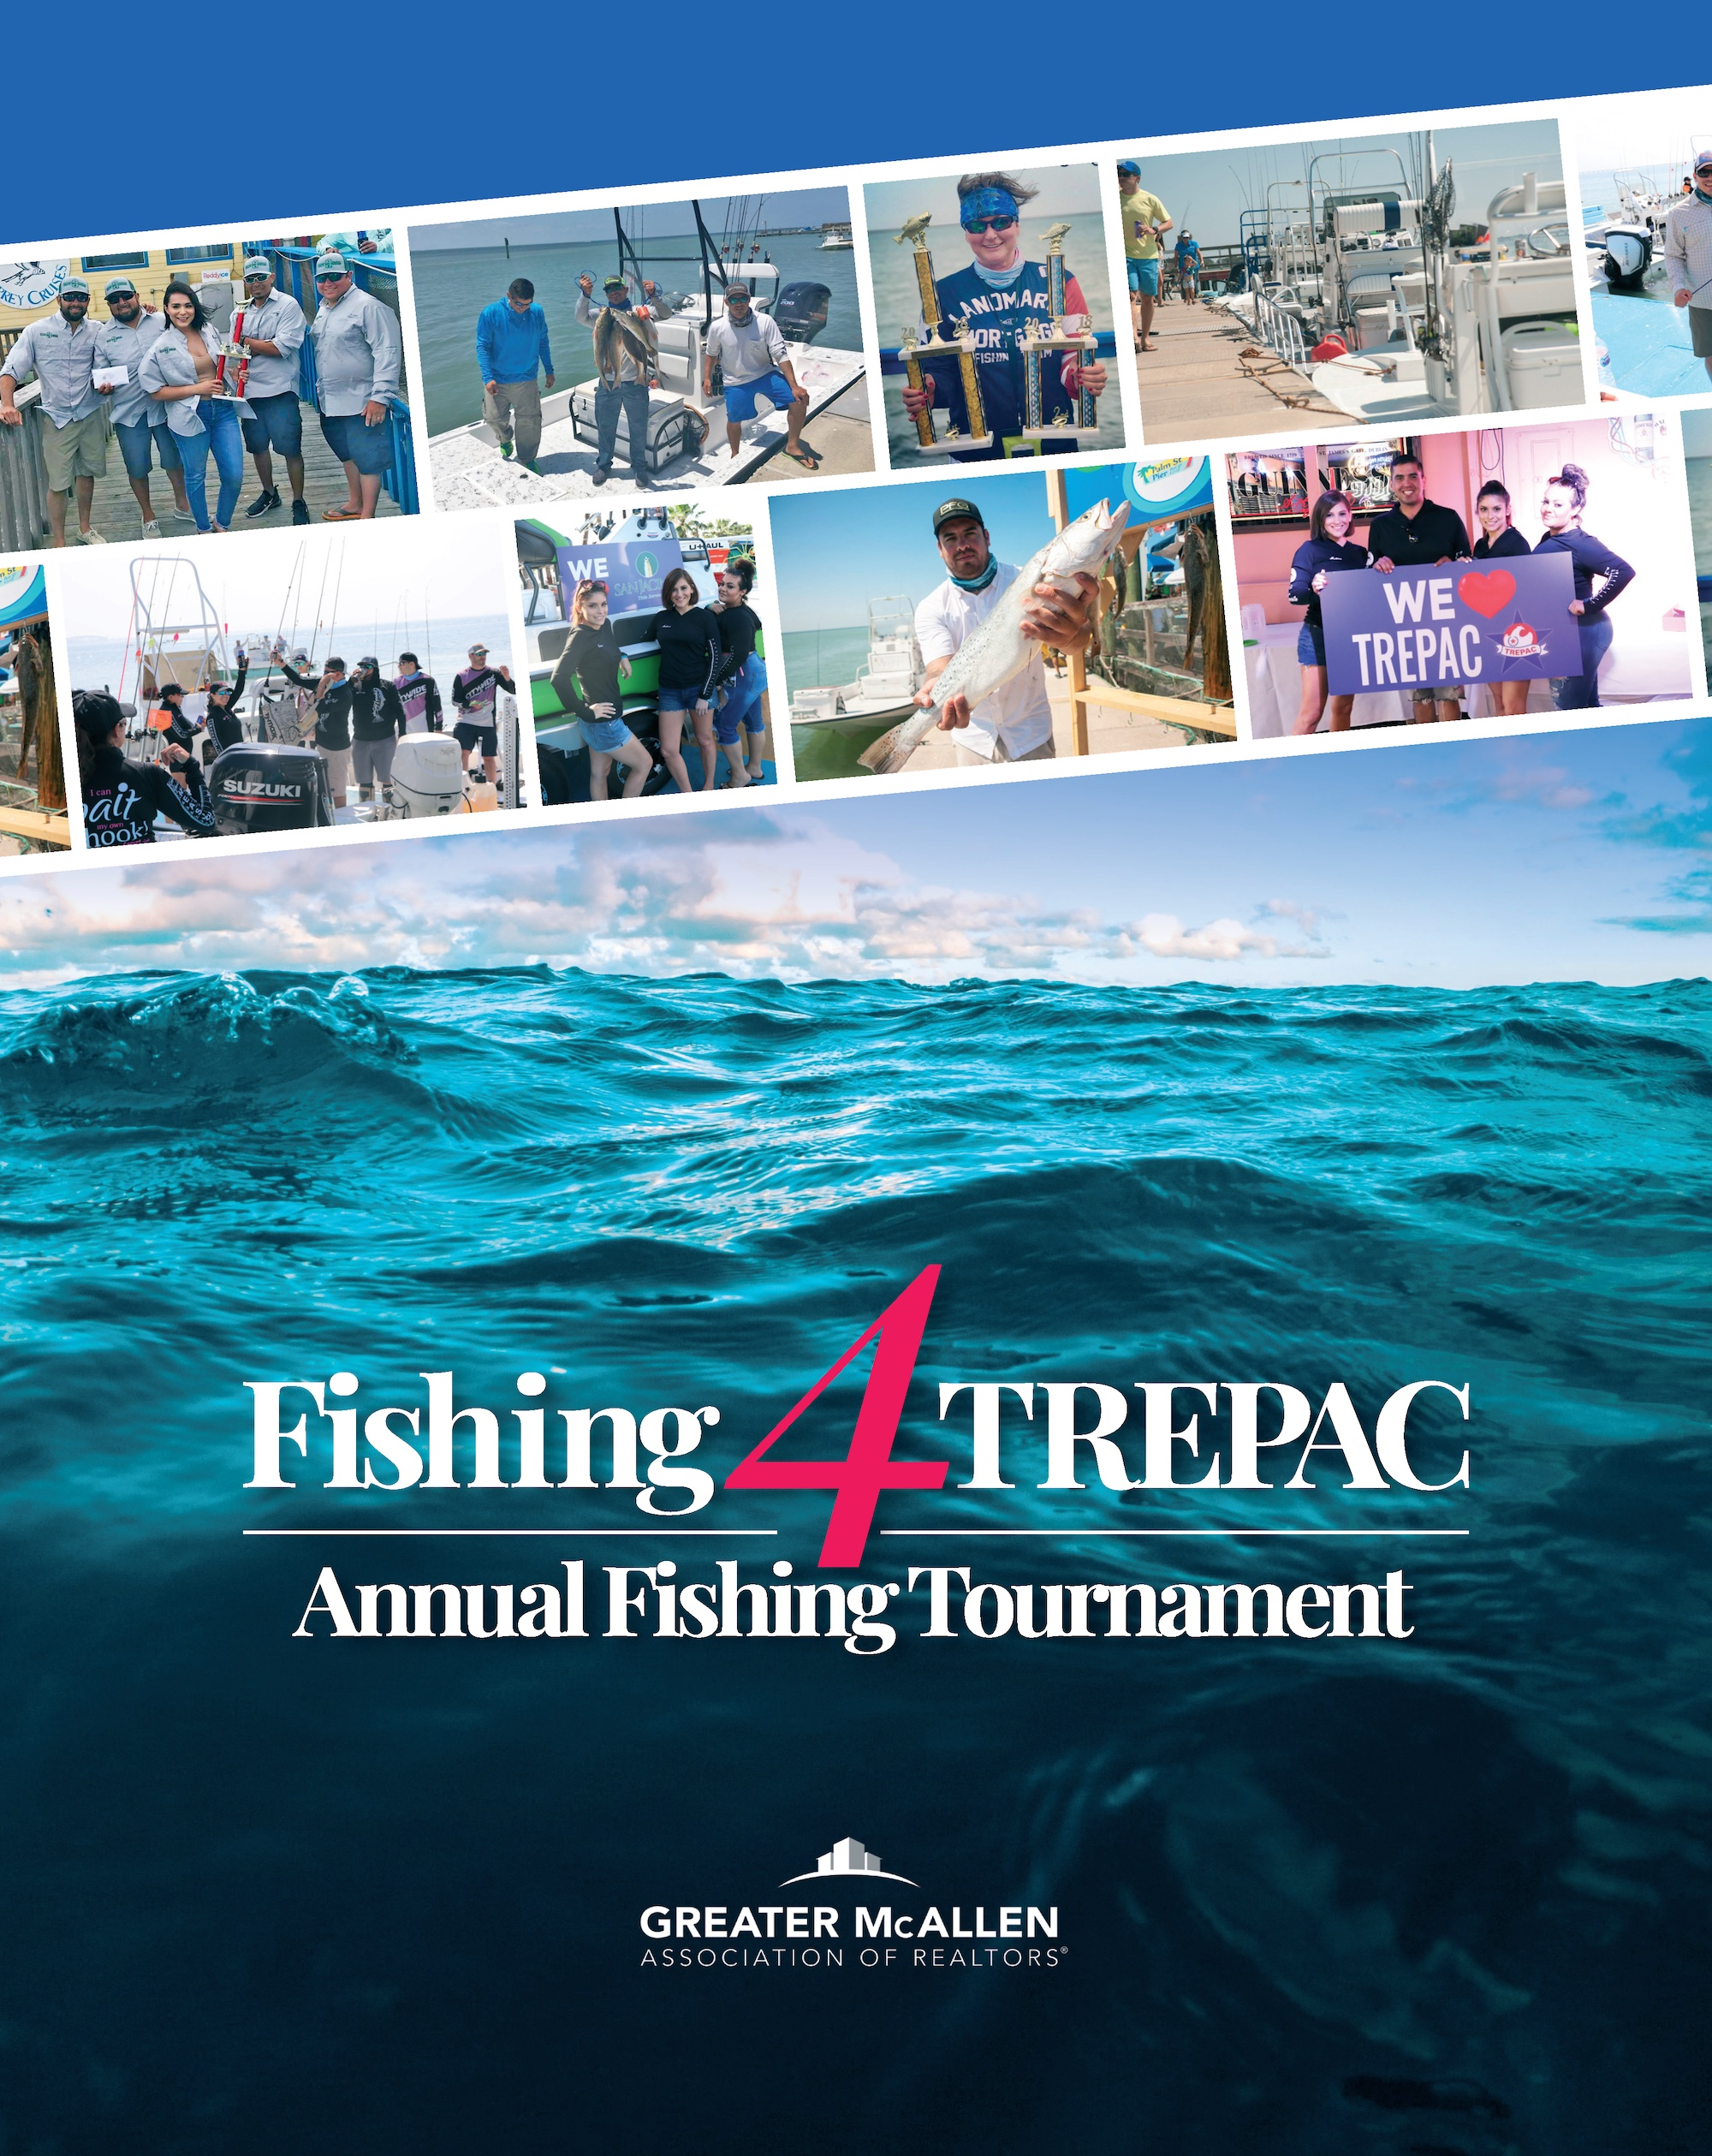 2021 - Fishing Tournament v7_Page_1 copy 2000